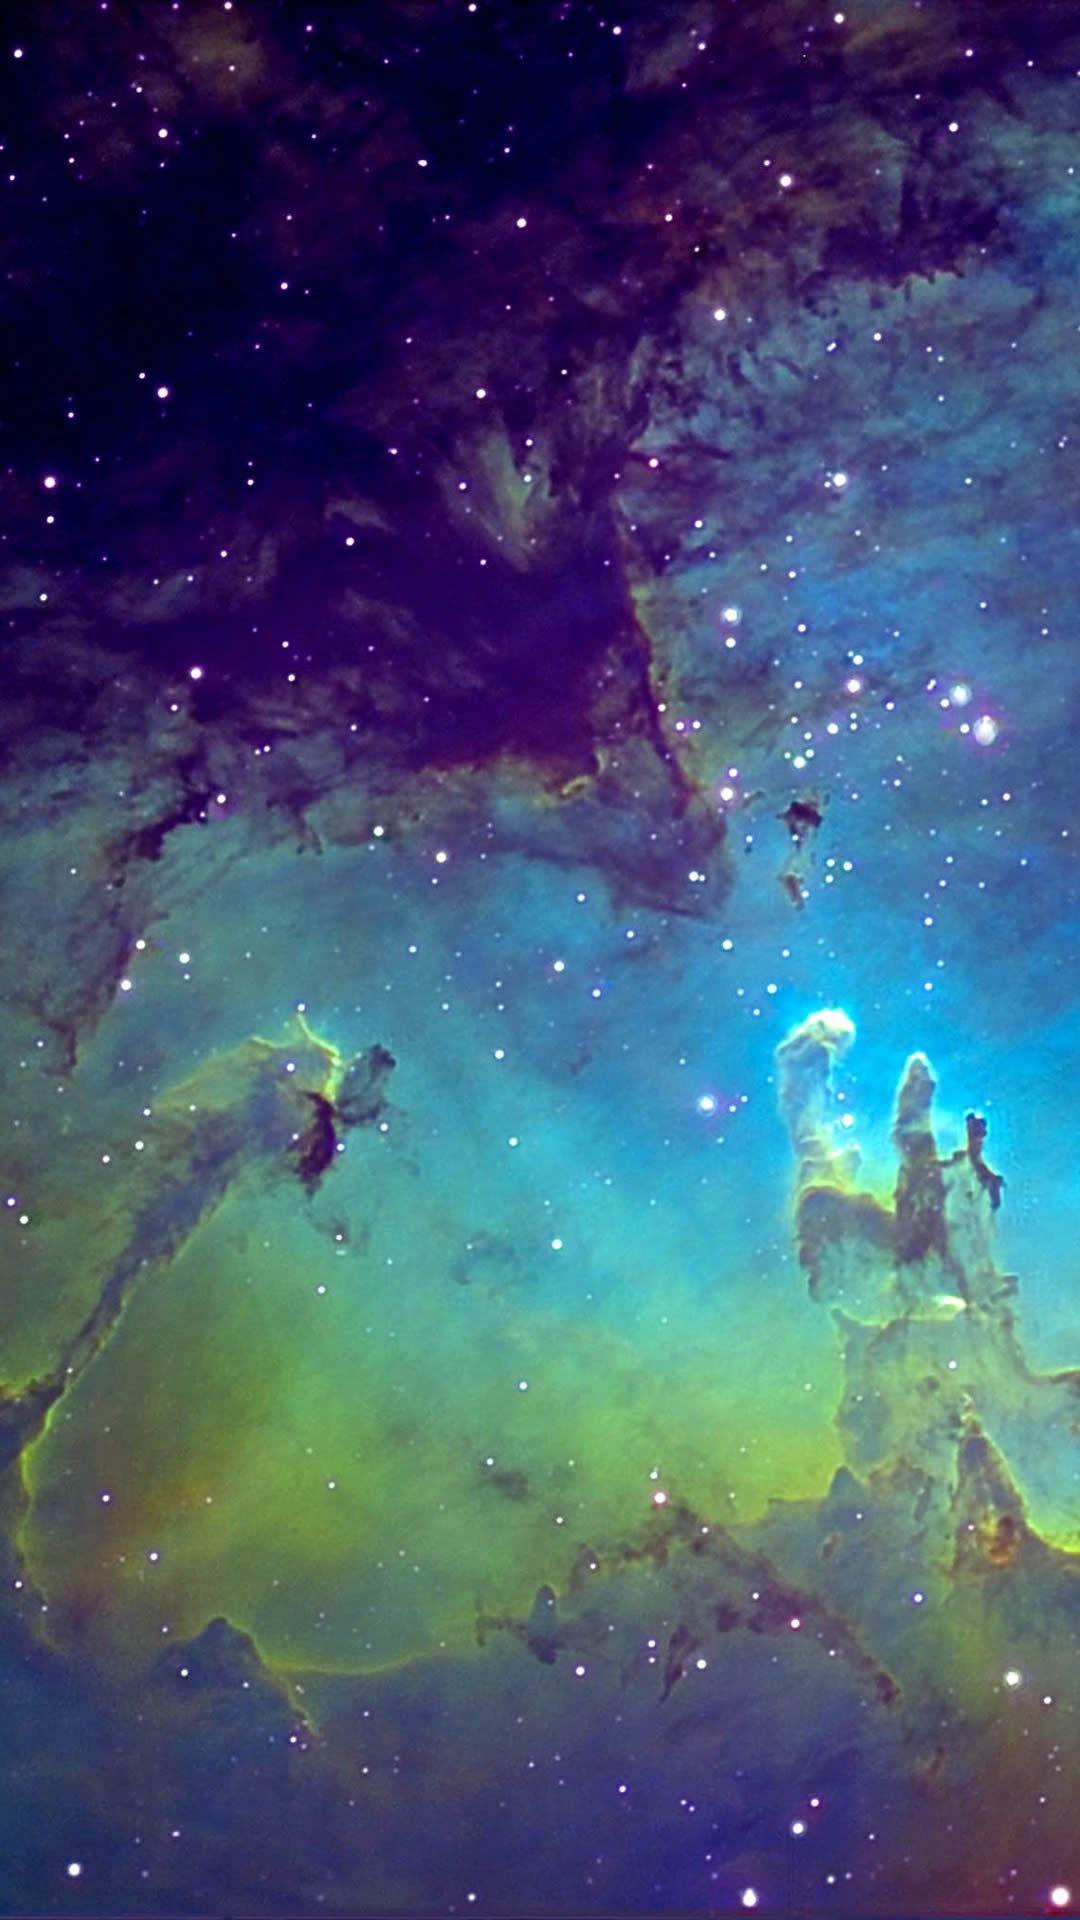 Fantasy Nebula Space iPhone 6 wallpaper Background